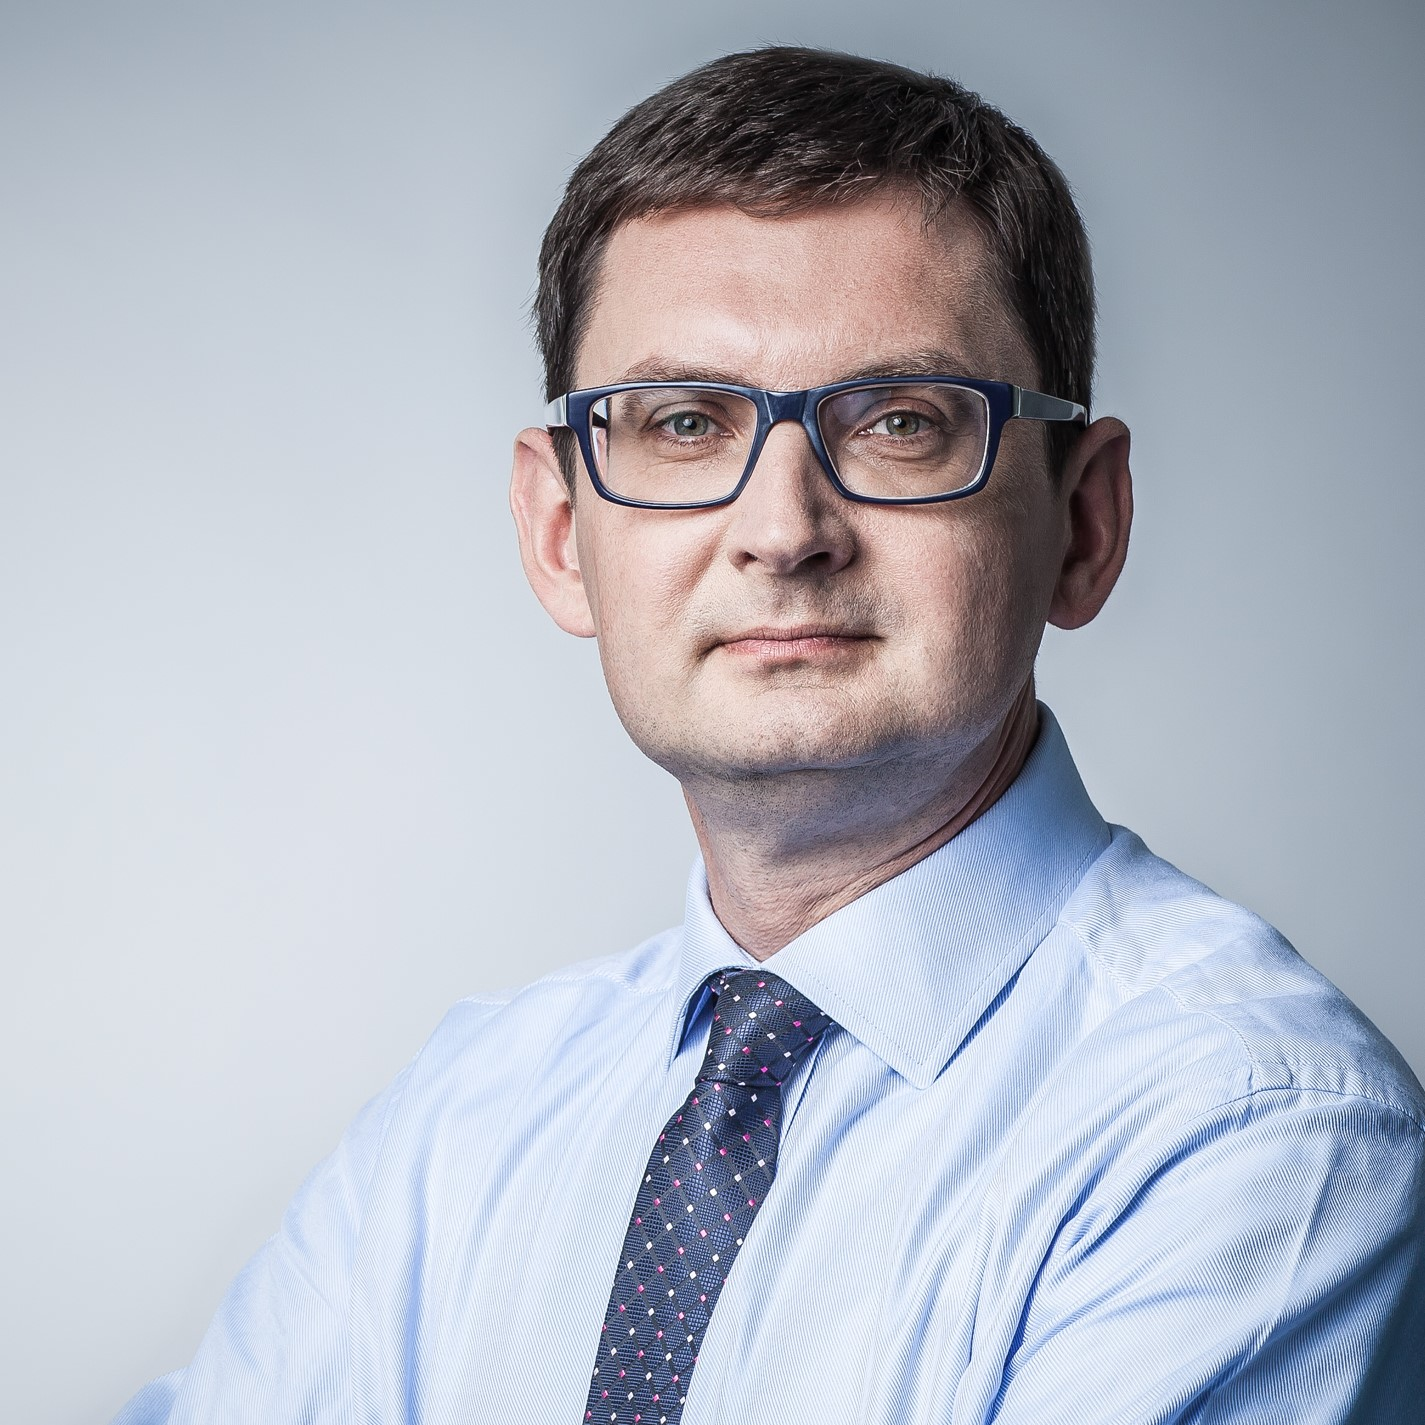 https://tundraadvisory.com/wp-content/uploads/2020/06/Przemyslaw-Kalek_kwadrat.jpg